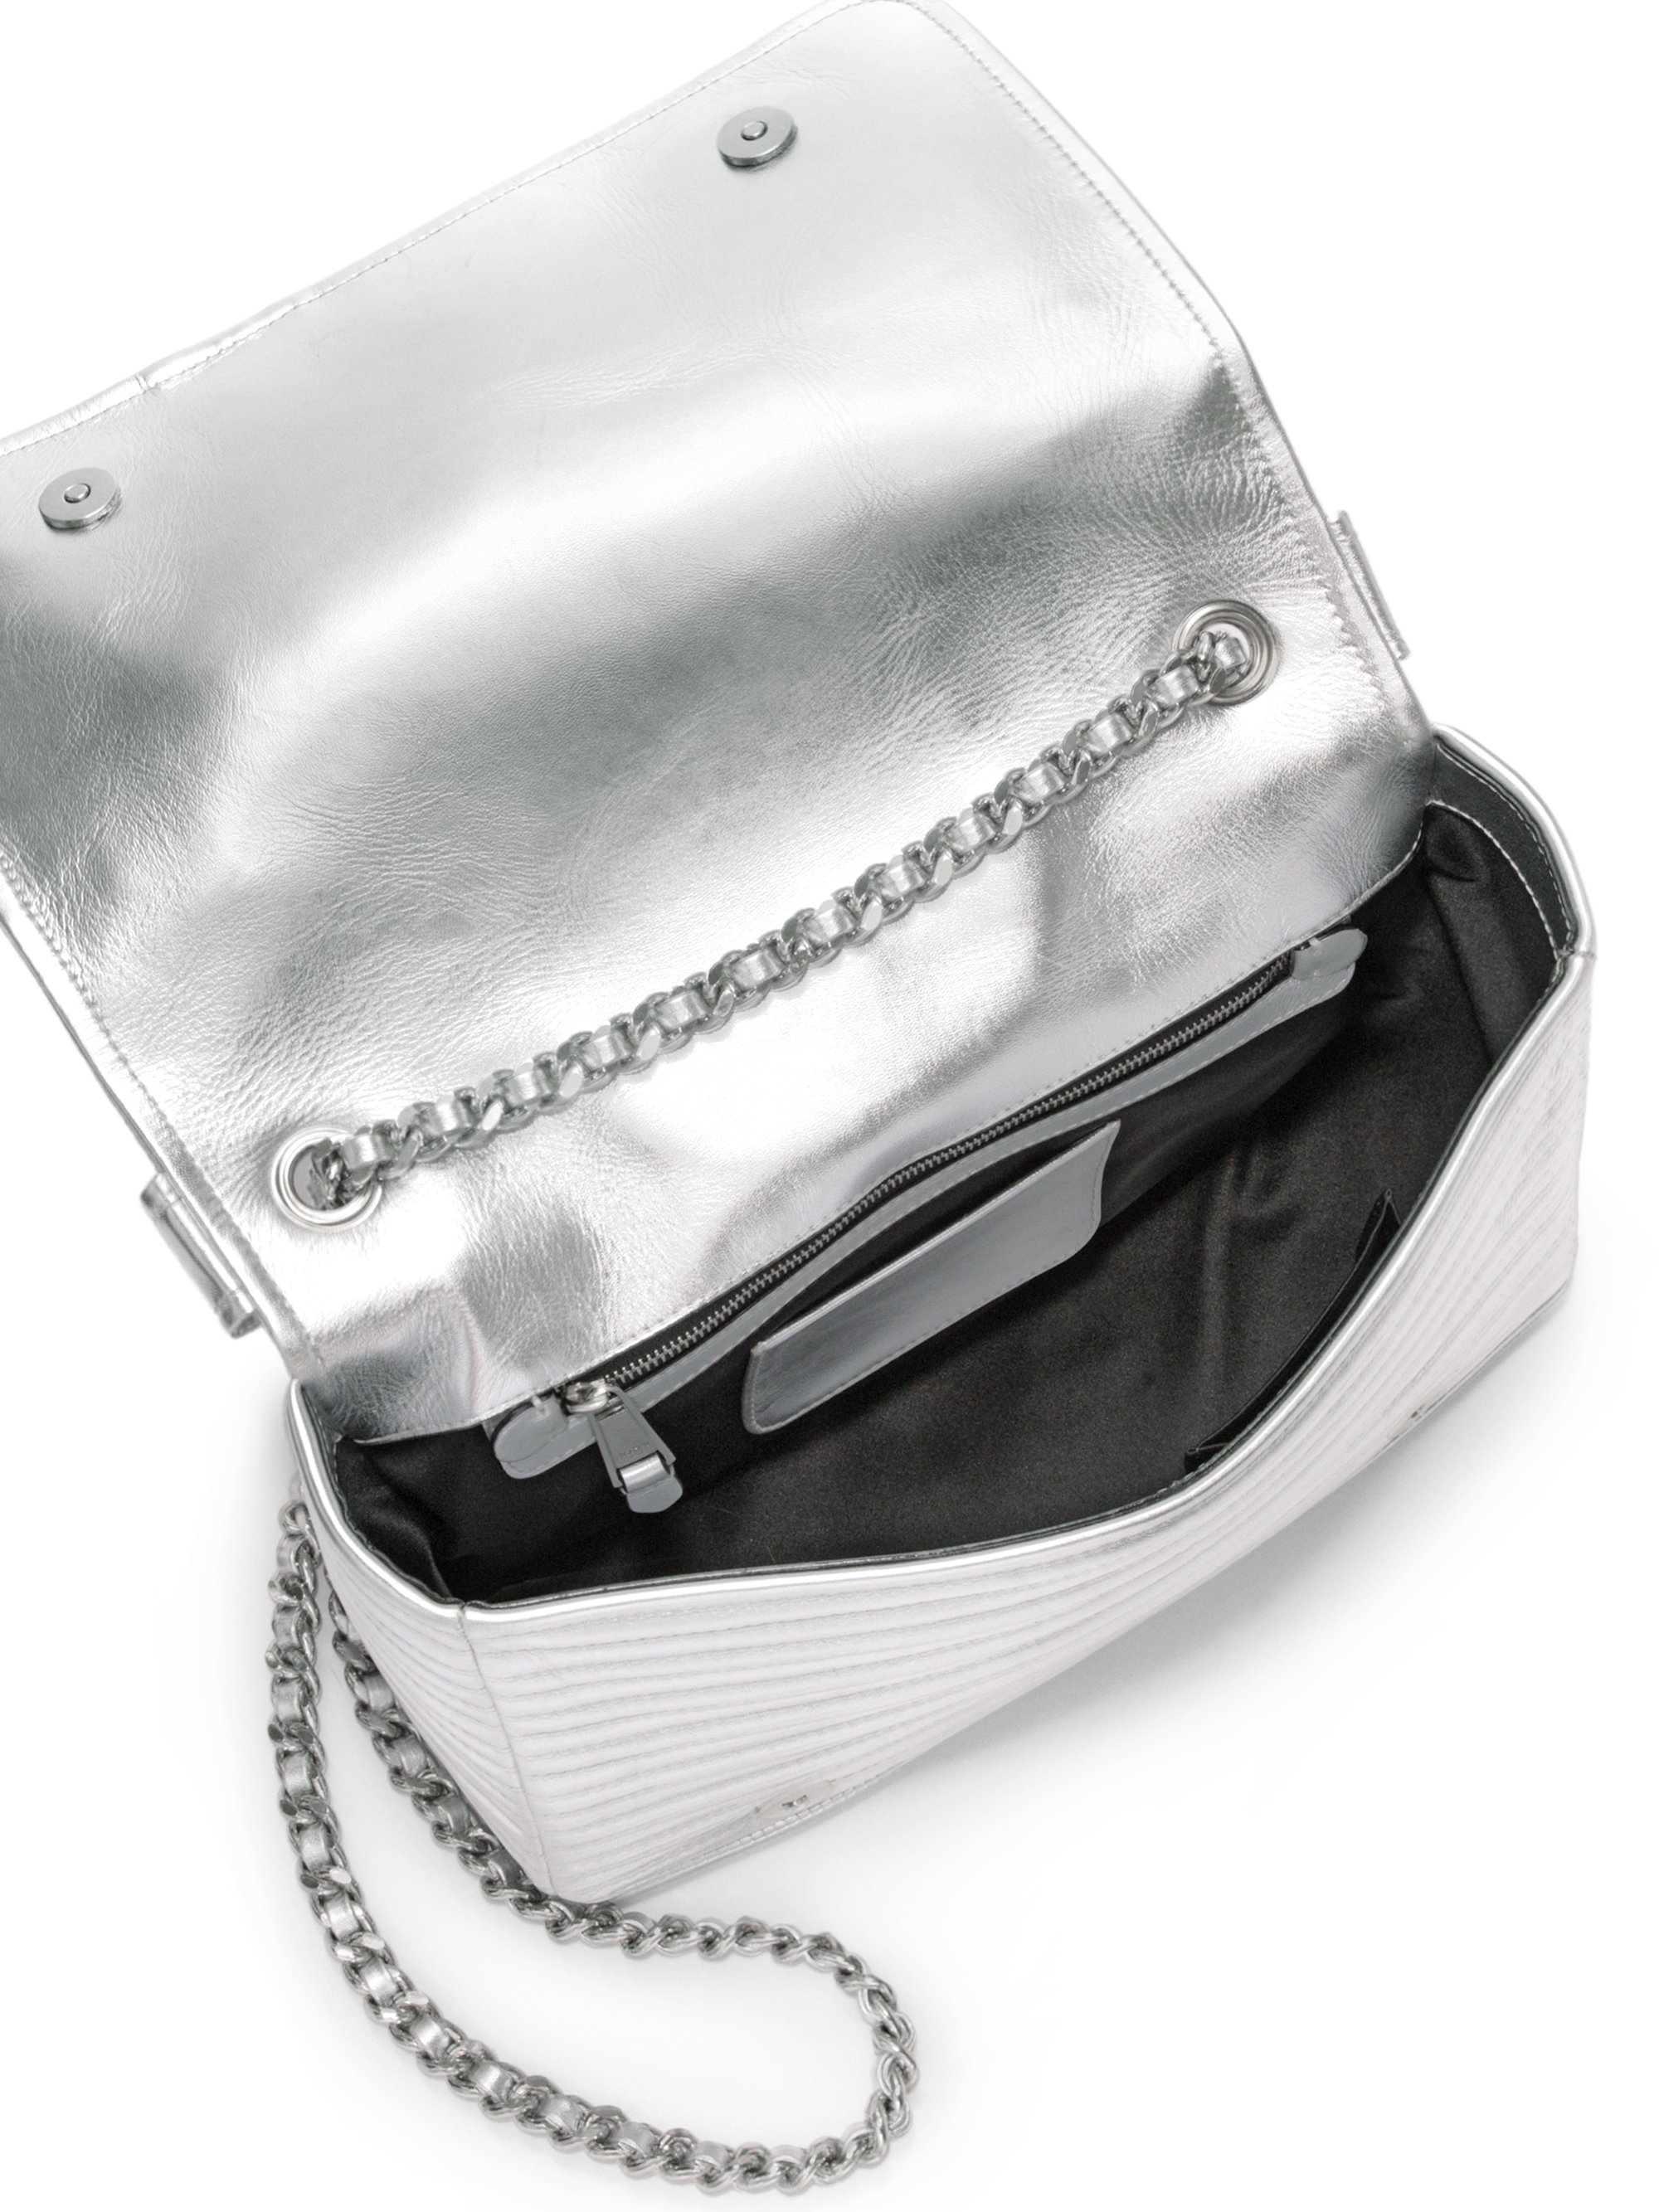 ec598ccc4 Moschino Moto Jacket Metallic Faux Leather Crossbody Bag in Metallic ...